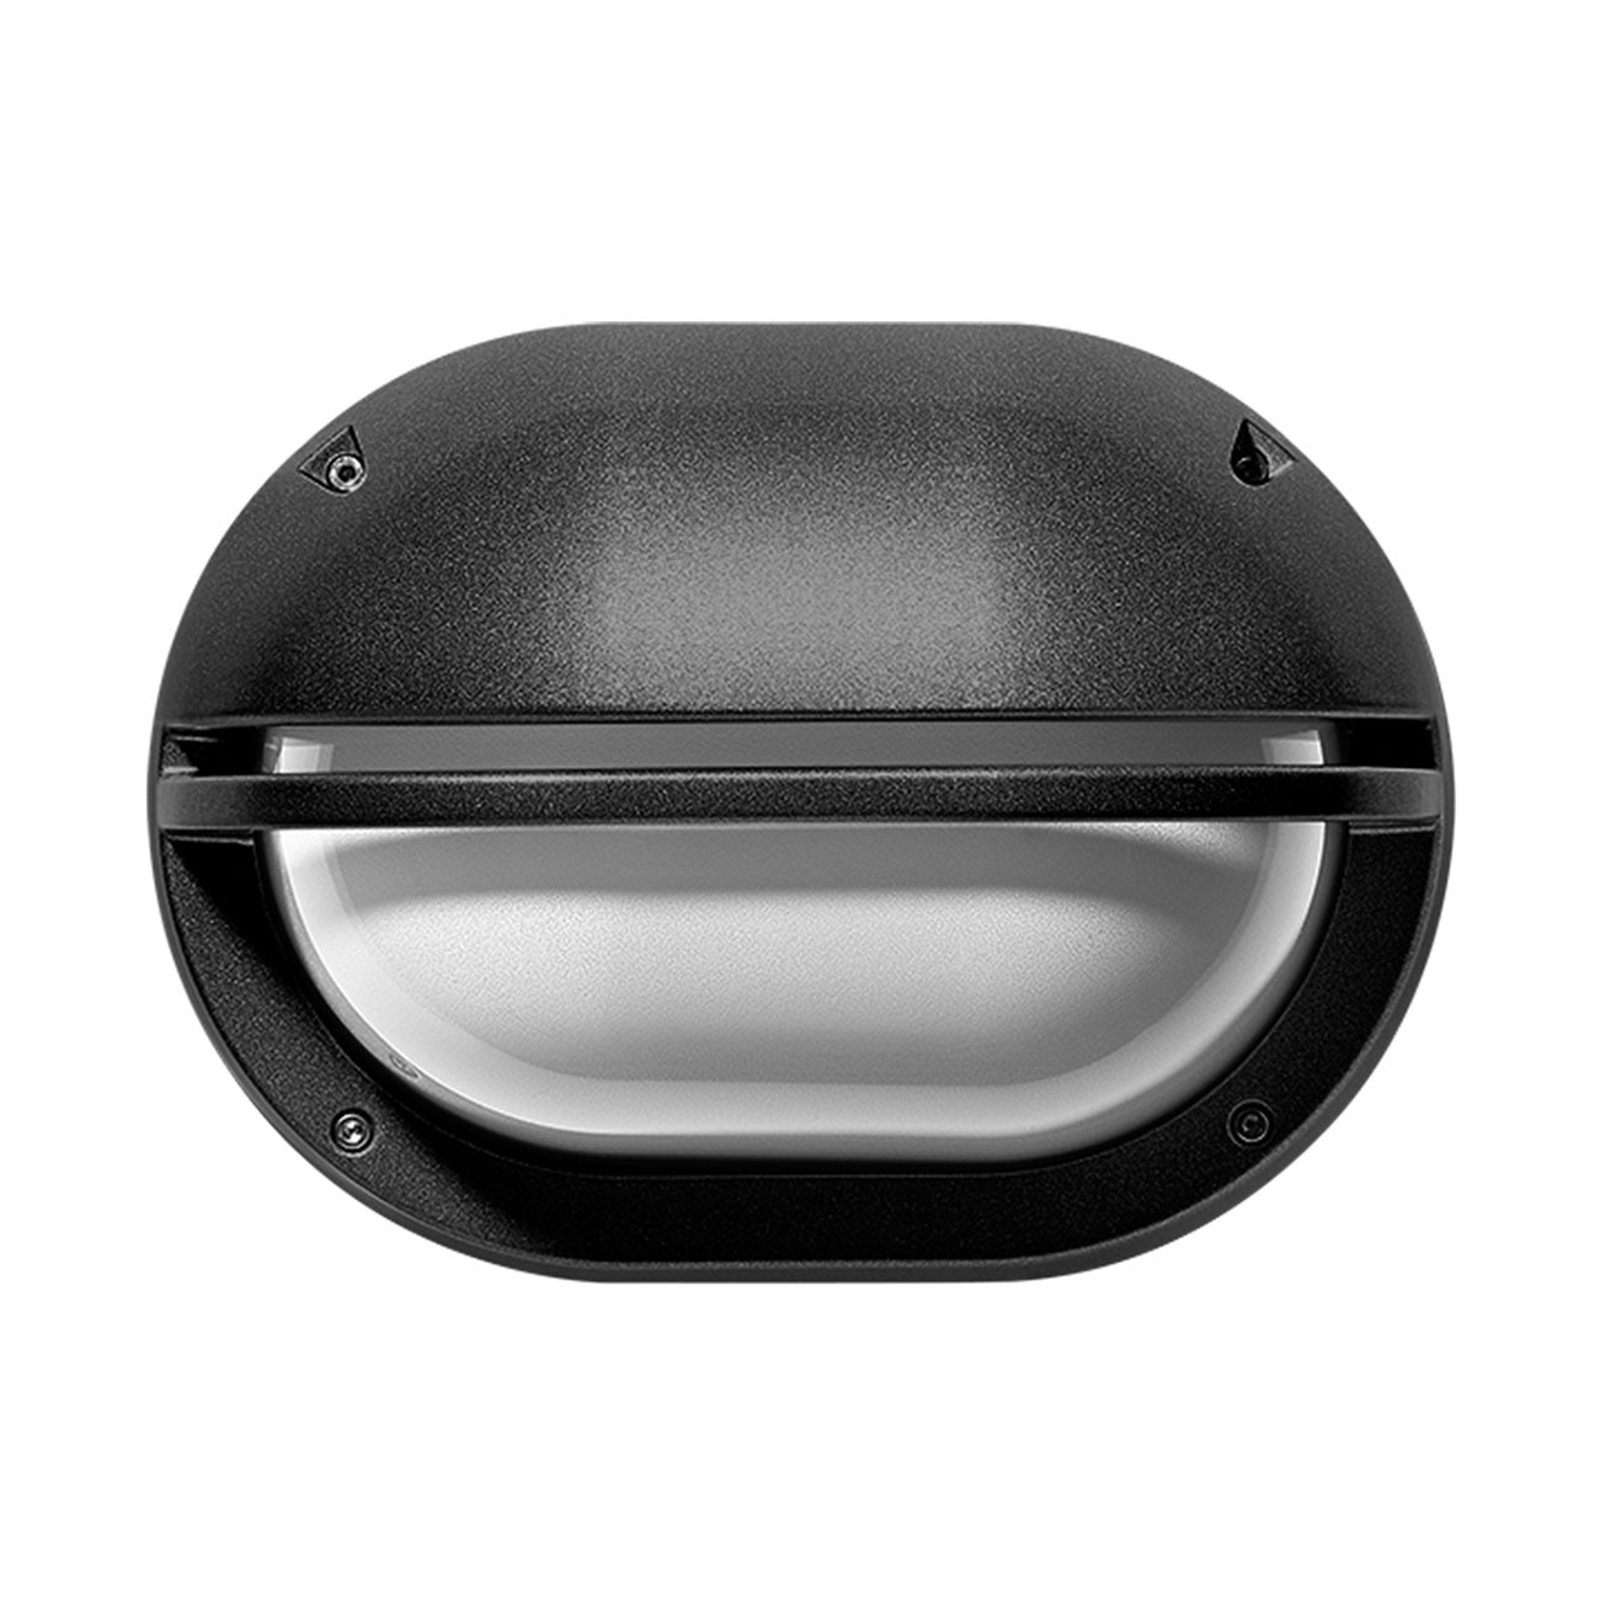 Applique LED Eko+19 Grill anthr. métallisé 3000K